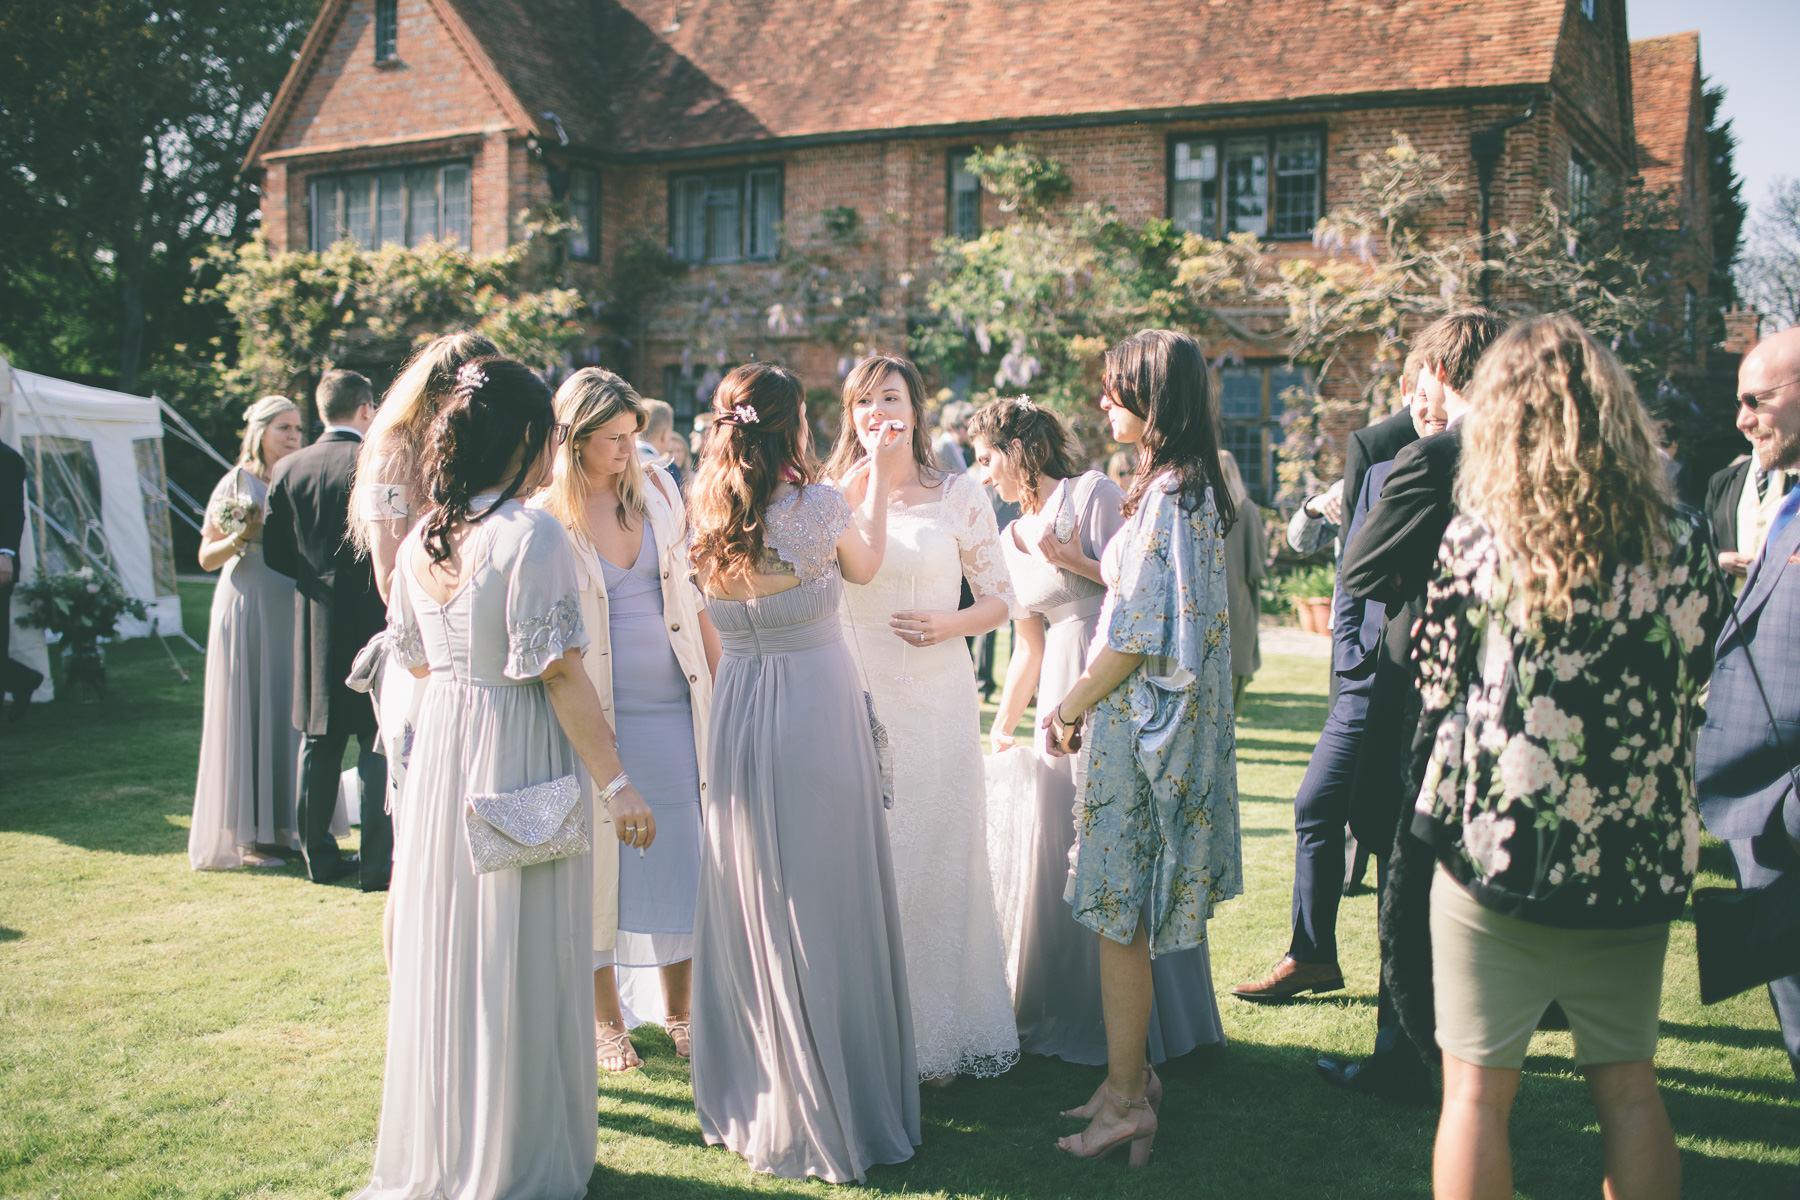 Pamber-Place-wedding-photography-basingstoke-hampshire-172